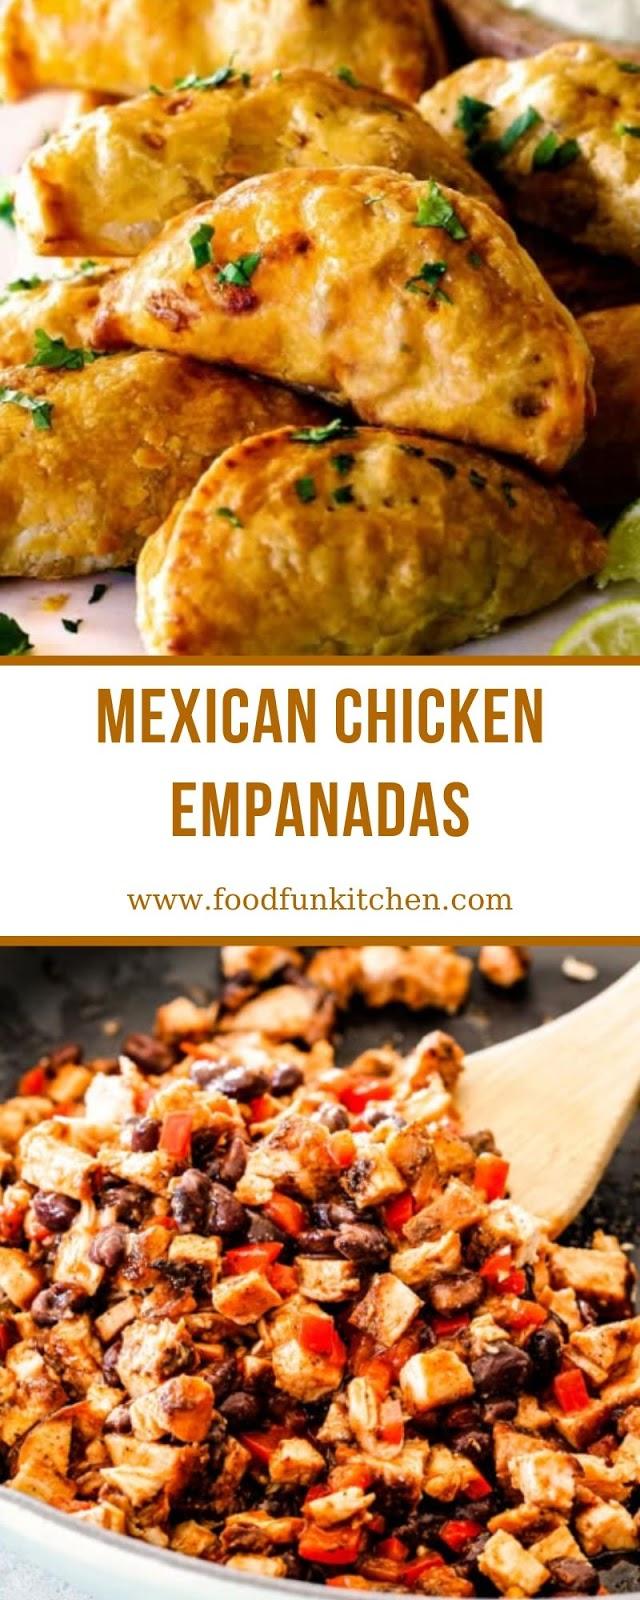 MEXICAN CHICKEN EMPANADAS